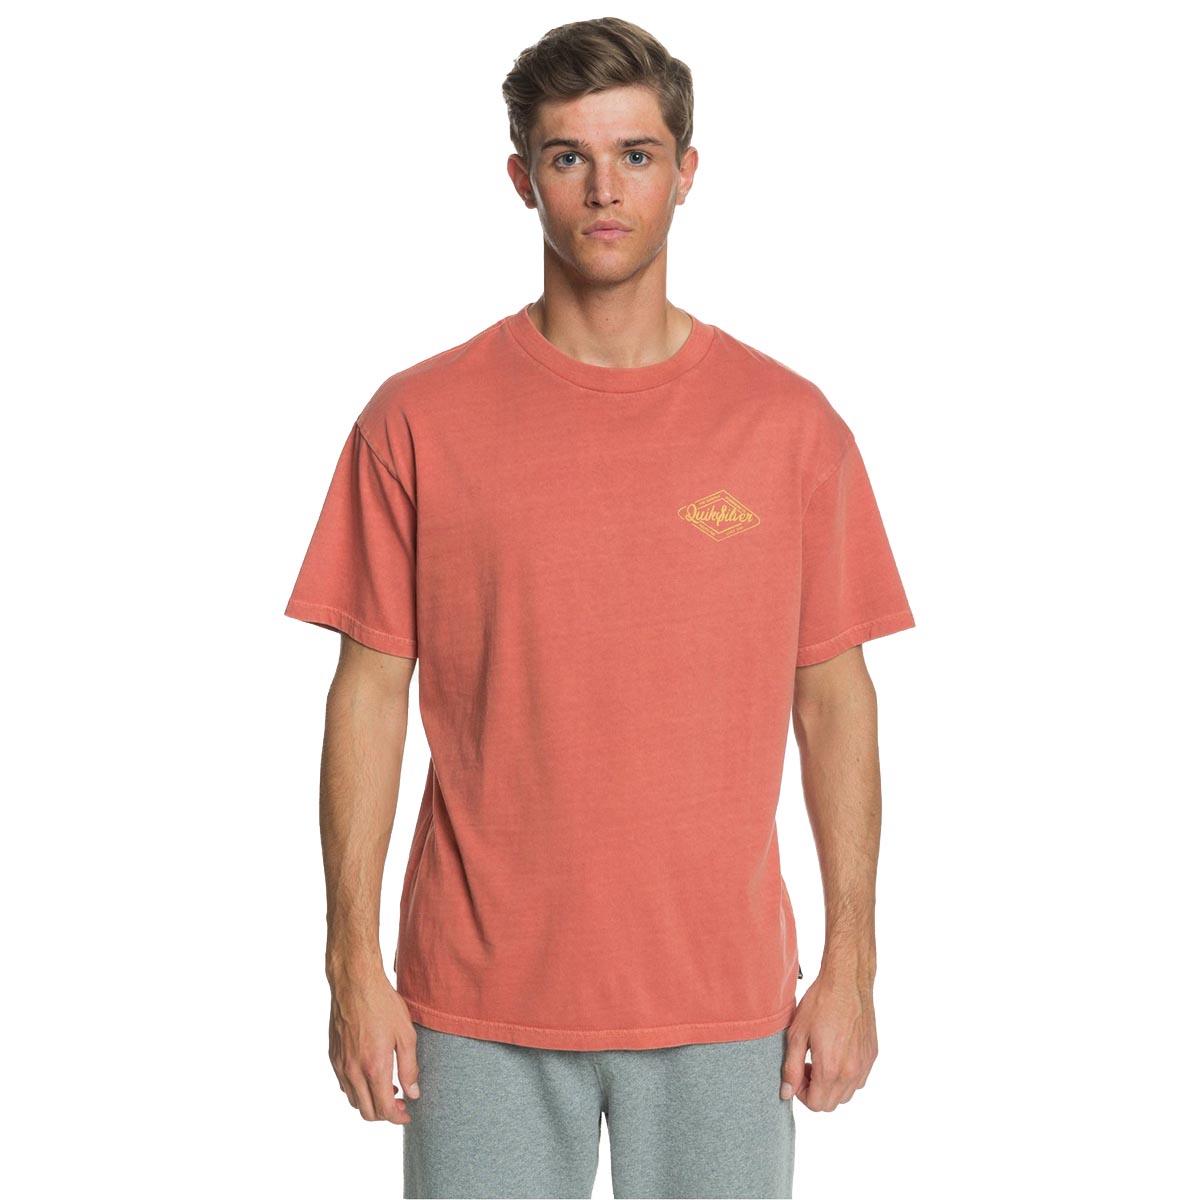 Quiksilver Harmony HALL SS T-Shirt EQYZT05999-MNL0